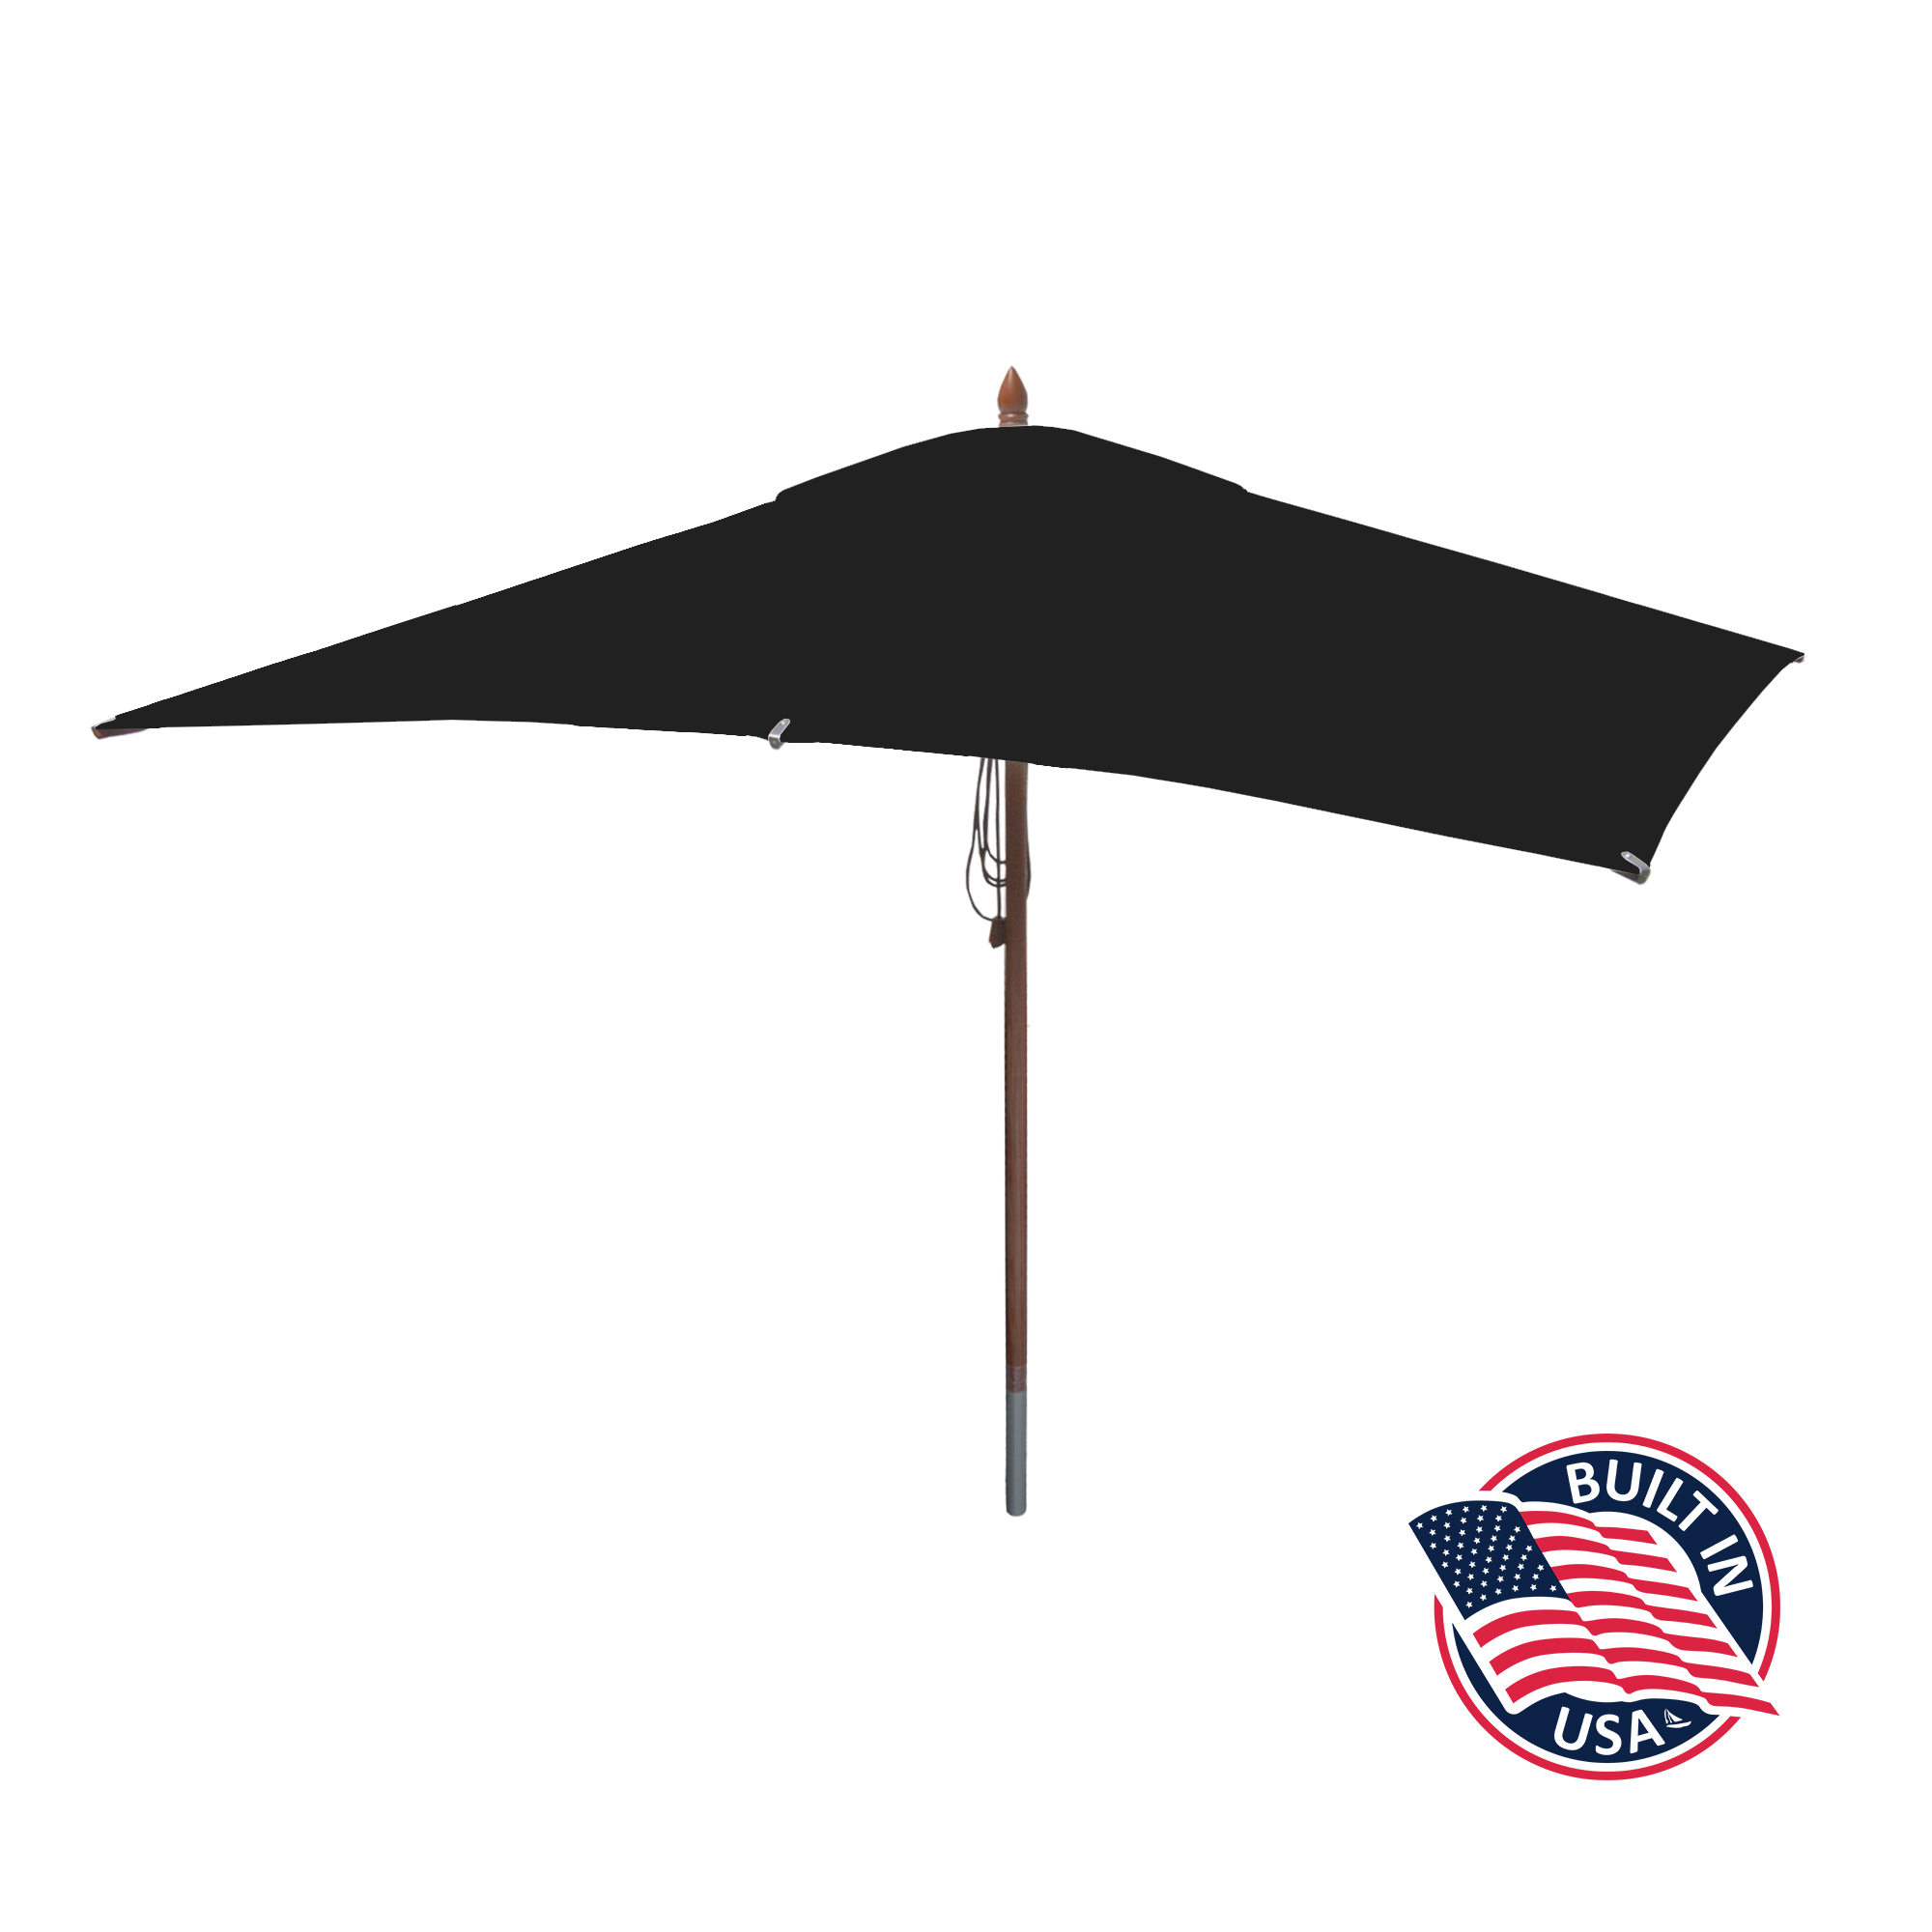 10' x 6.5' Rectangle Patio Umbrella